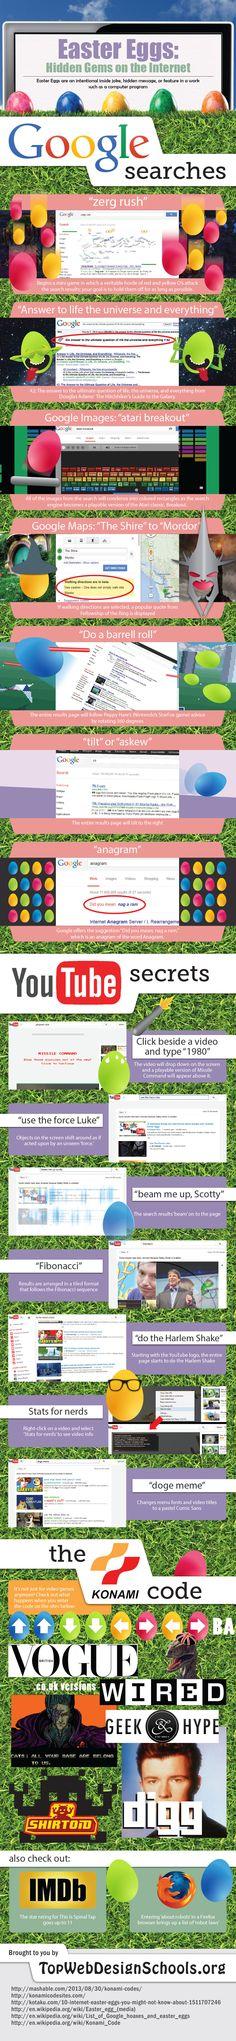 Easter Eggs: Hidden Gems of the Internet